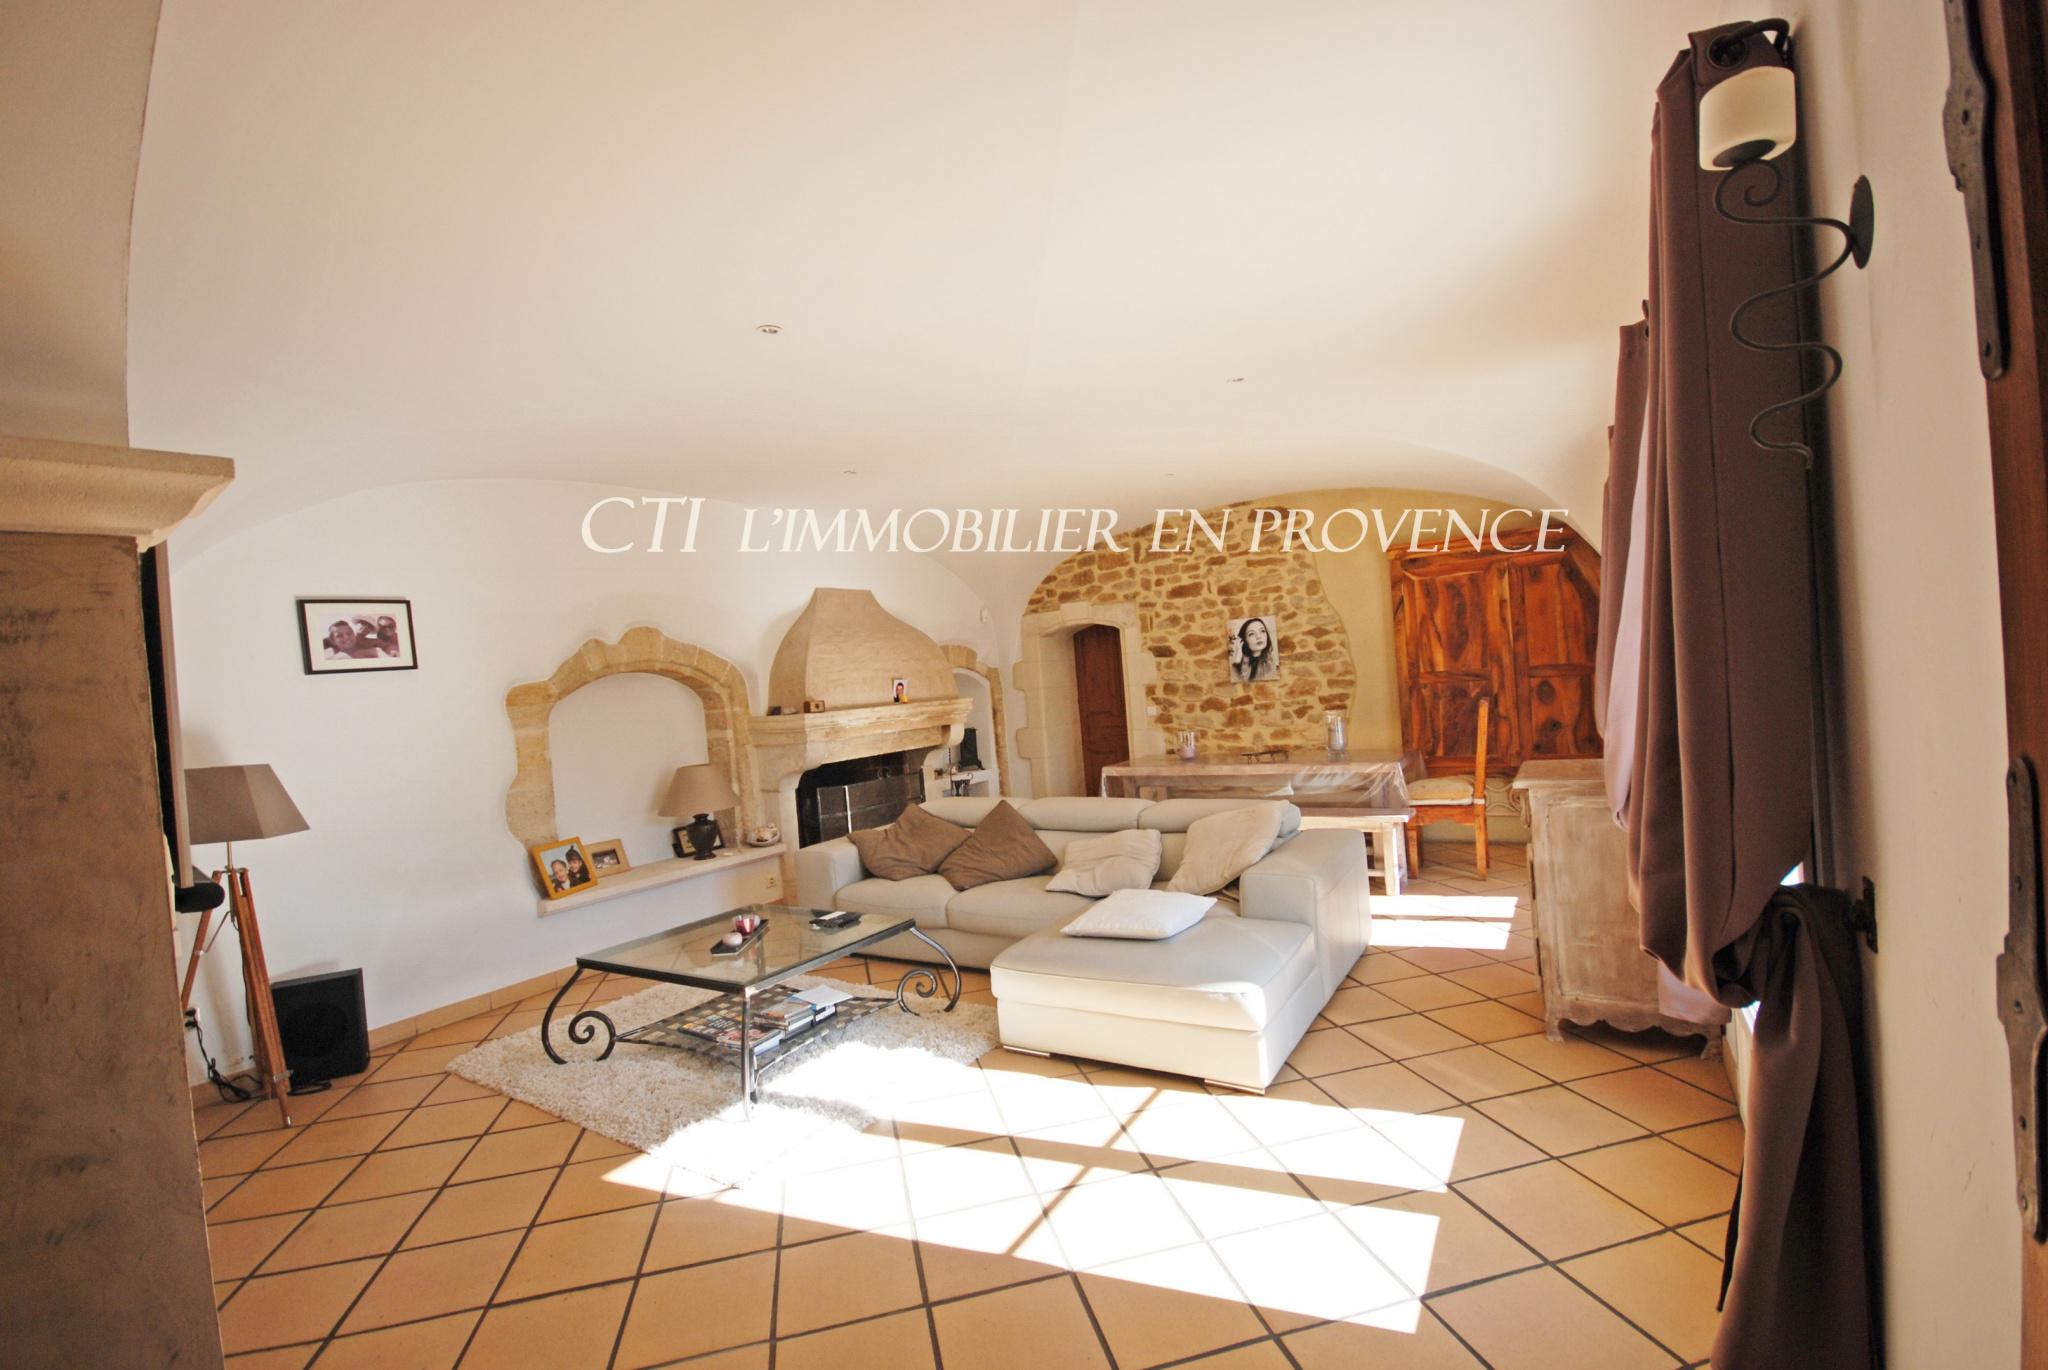 0 www.cti-provence.net MAS PROVENÇAL PIERRE CHARME CALME CAMPAGNE JARDIN PISCINE GARAGE CAVES